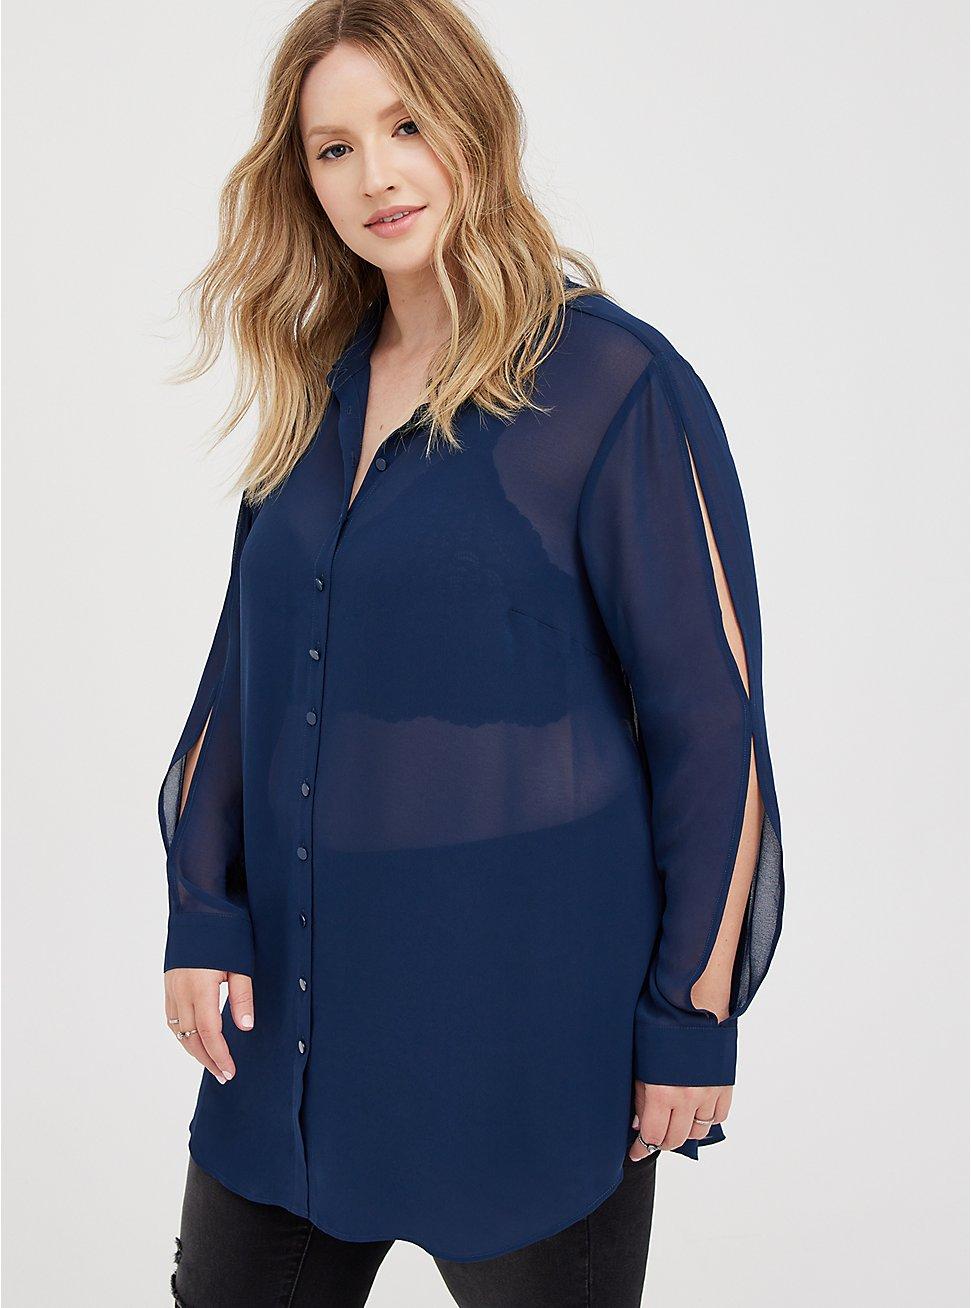 Cold Shoulder Tunic Shirt - Chiffon Navy, DRESS BLUE, hi-res